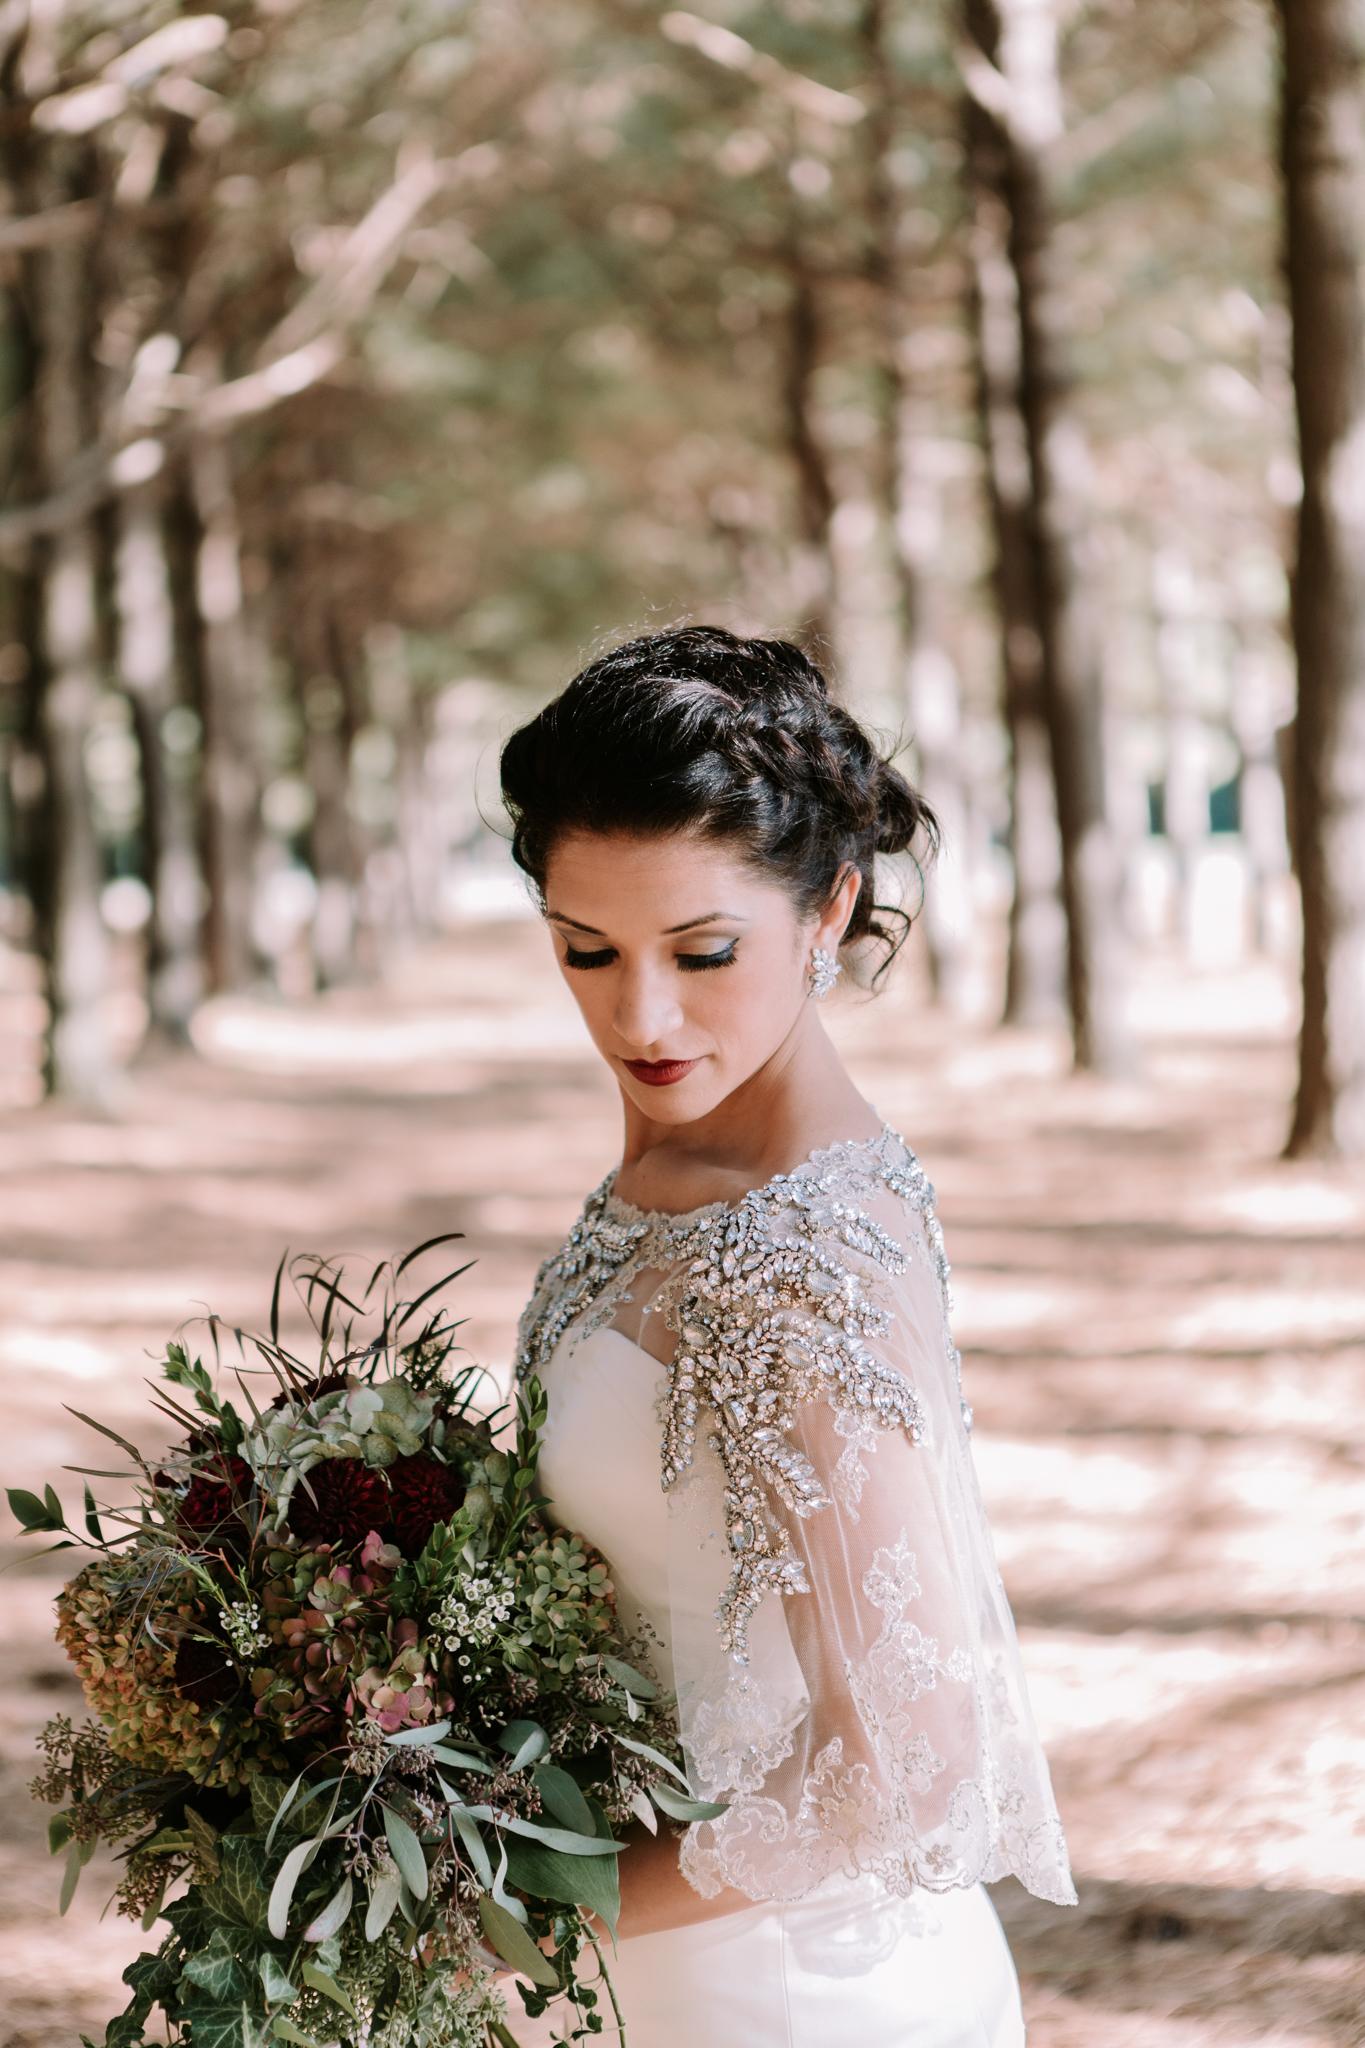 Richmond Kentucky Wedding Photographer - Ariana Jordan Photography -10.jpg